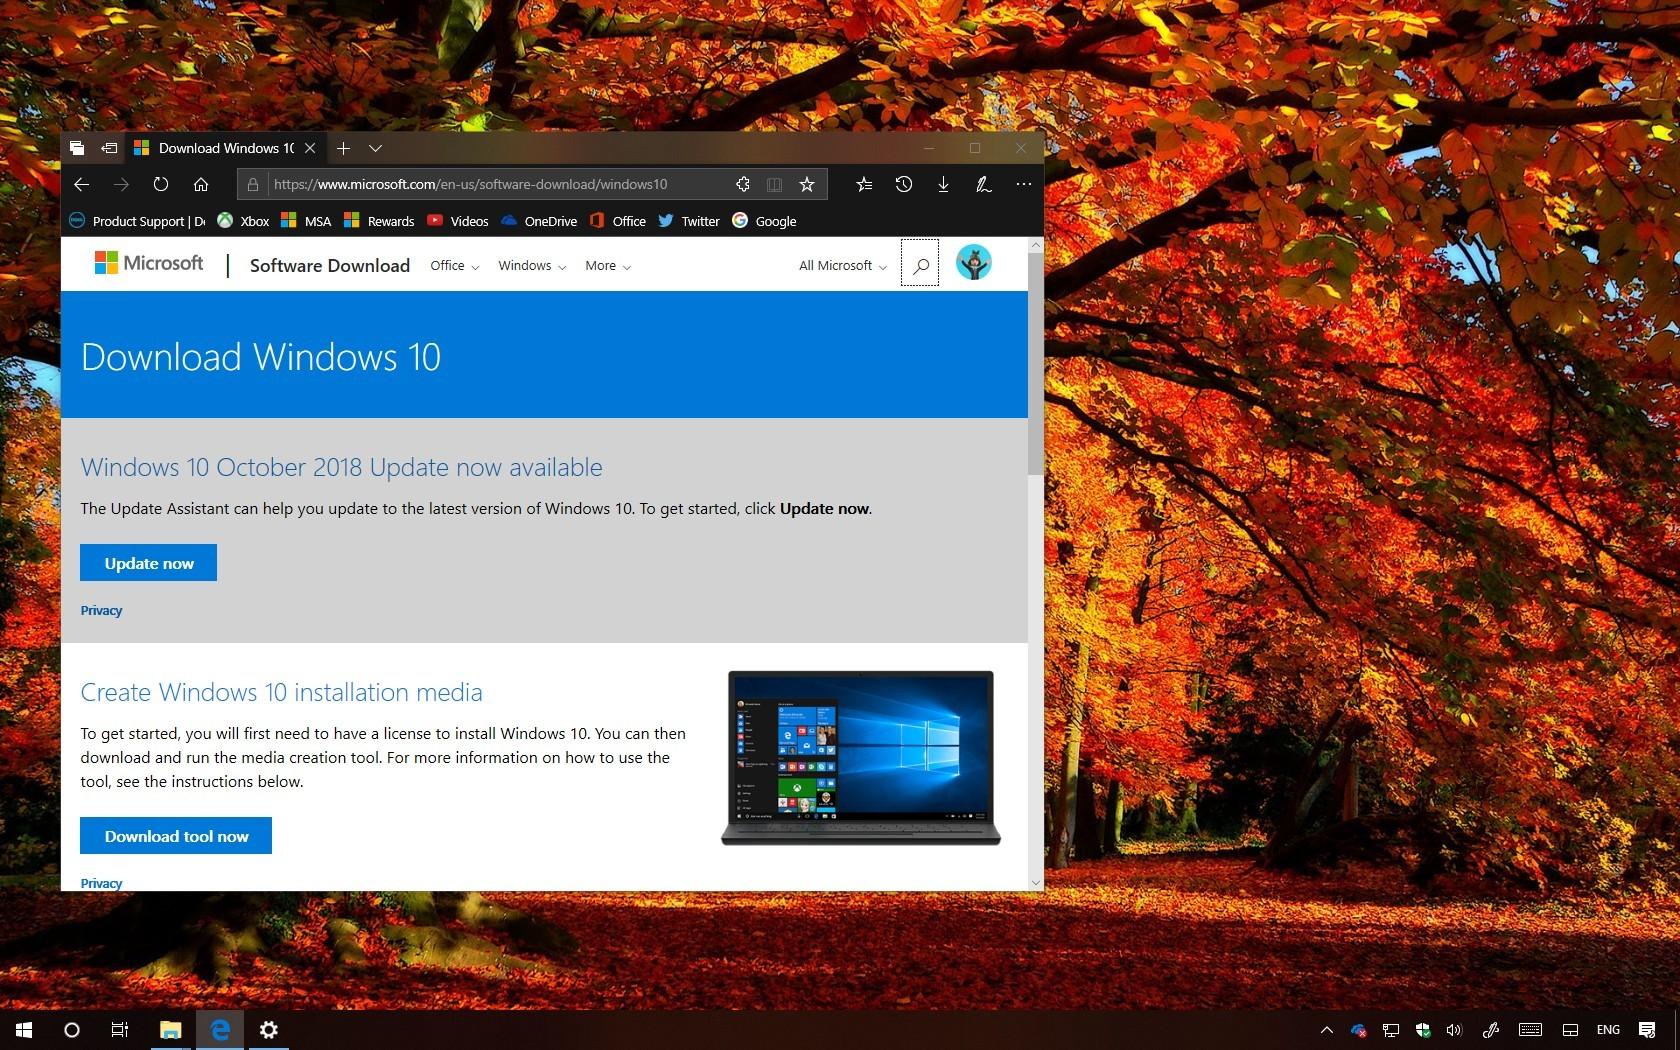 Windows 10 version 1809 release again on November 13